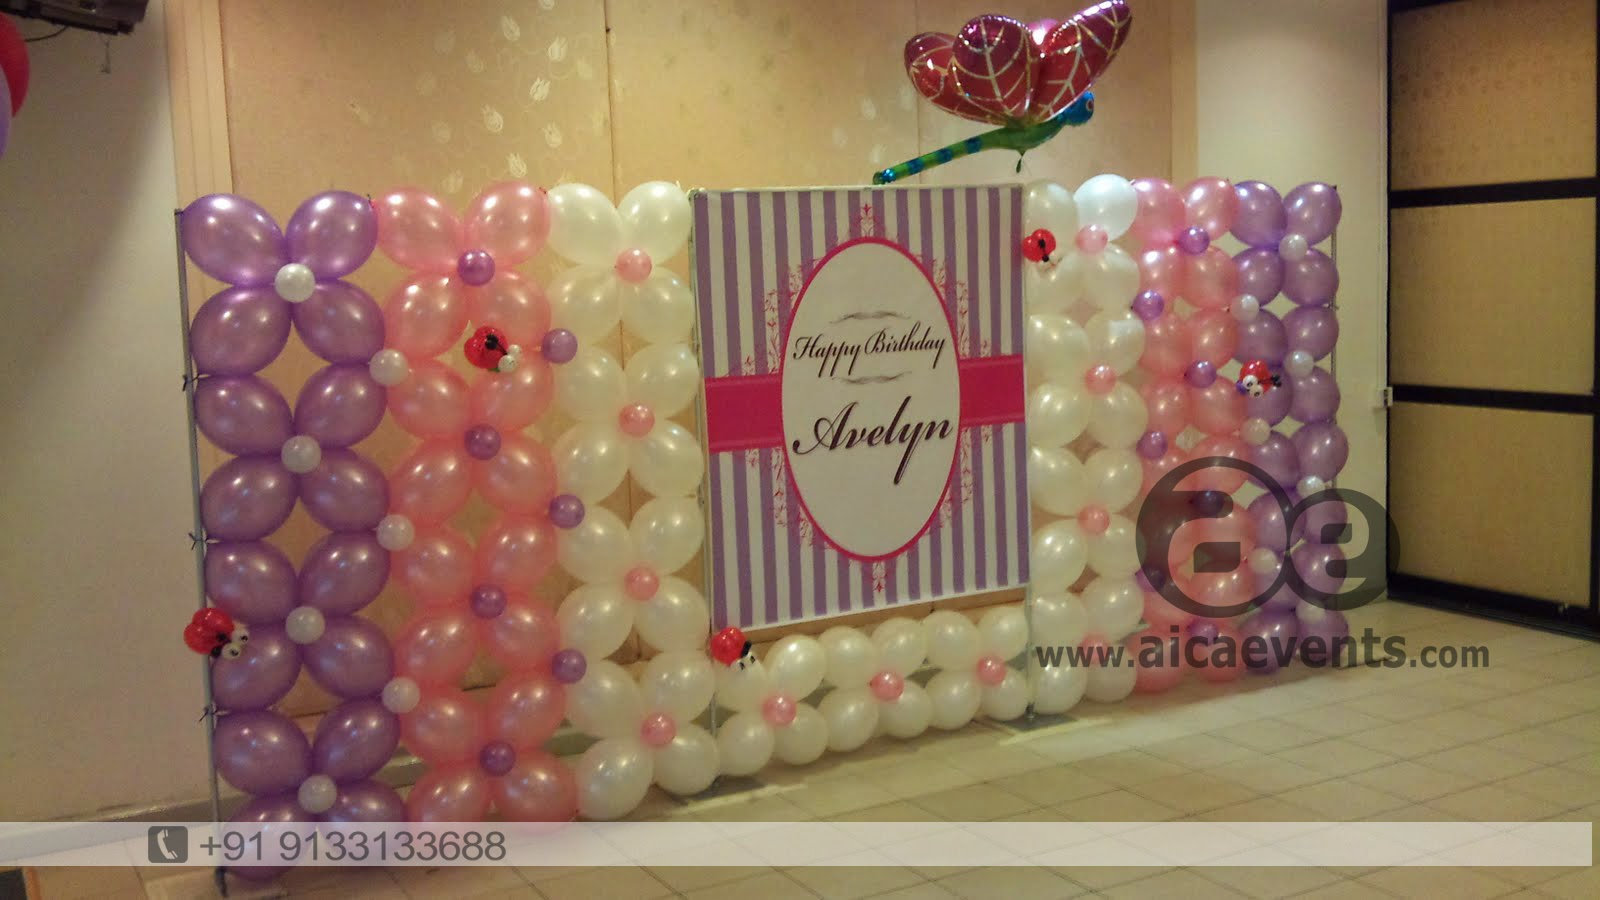 Aicaevents balloon decoration for birthday parties for Balloon decoration on wall for birthday